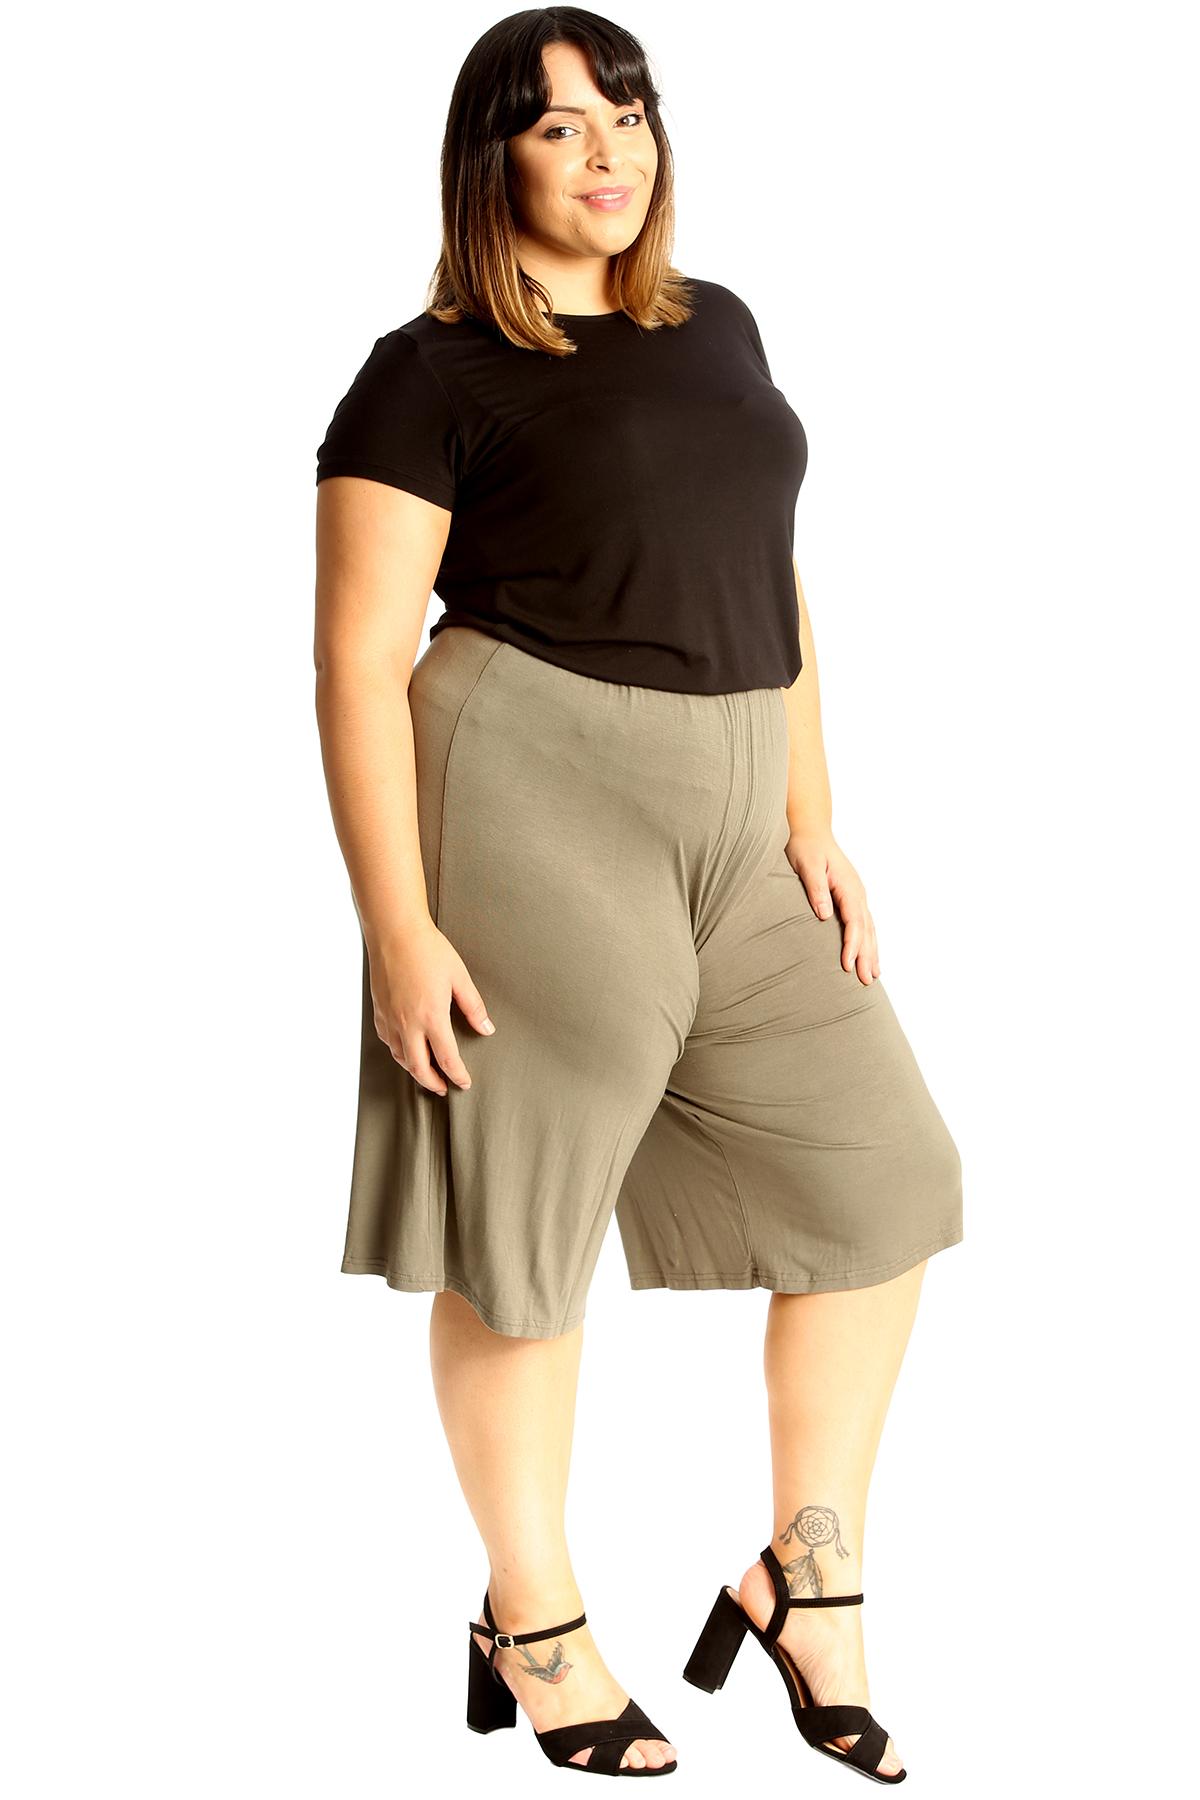 New-Womens-Plus-Size-Culottes-Ladies-Plain-Shorts-Palazzo-Elastic-Pants-Summer thumbnail 55